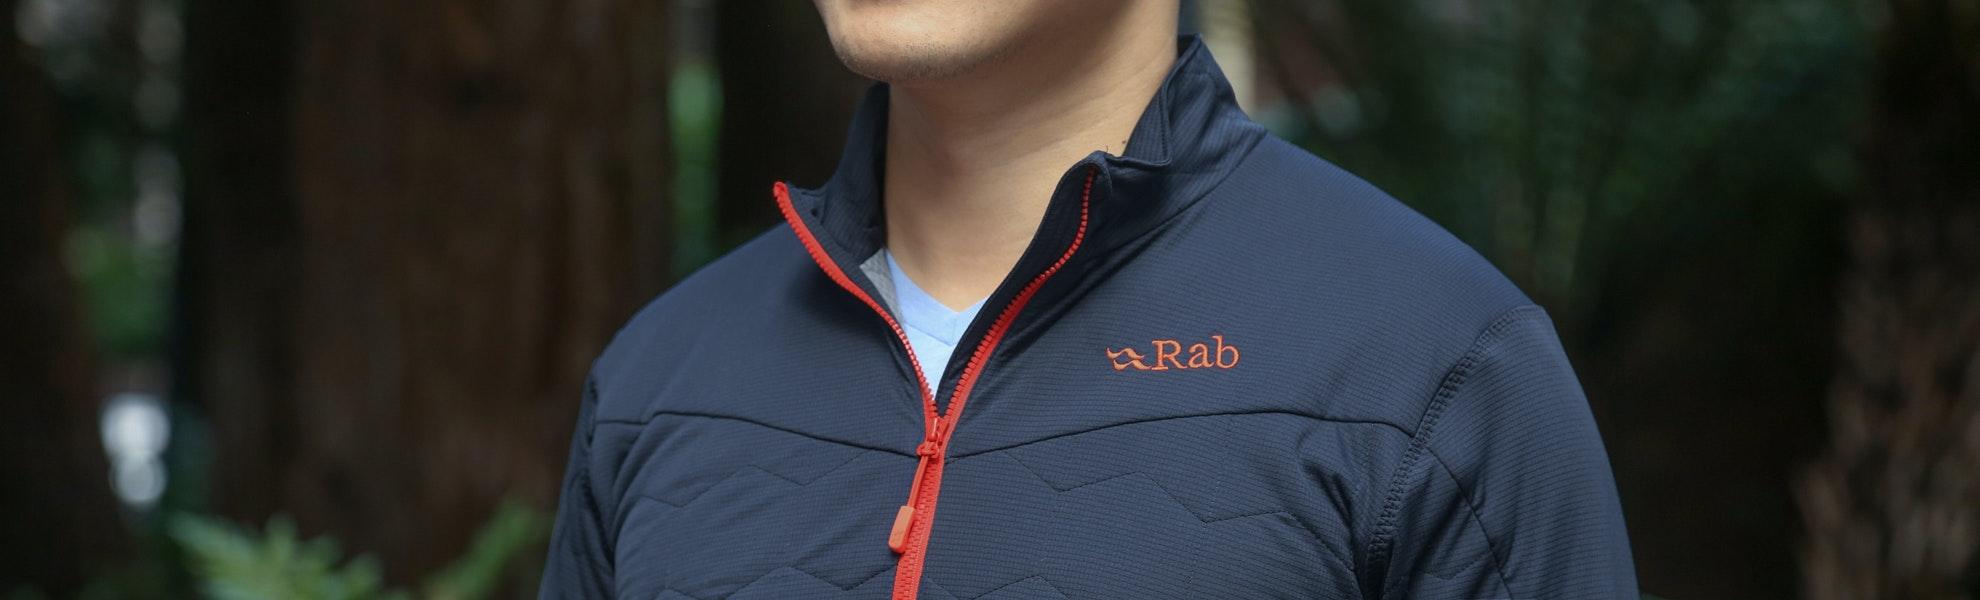 Rab Men's Paradox Pull-On